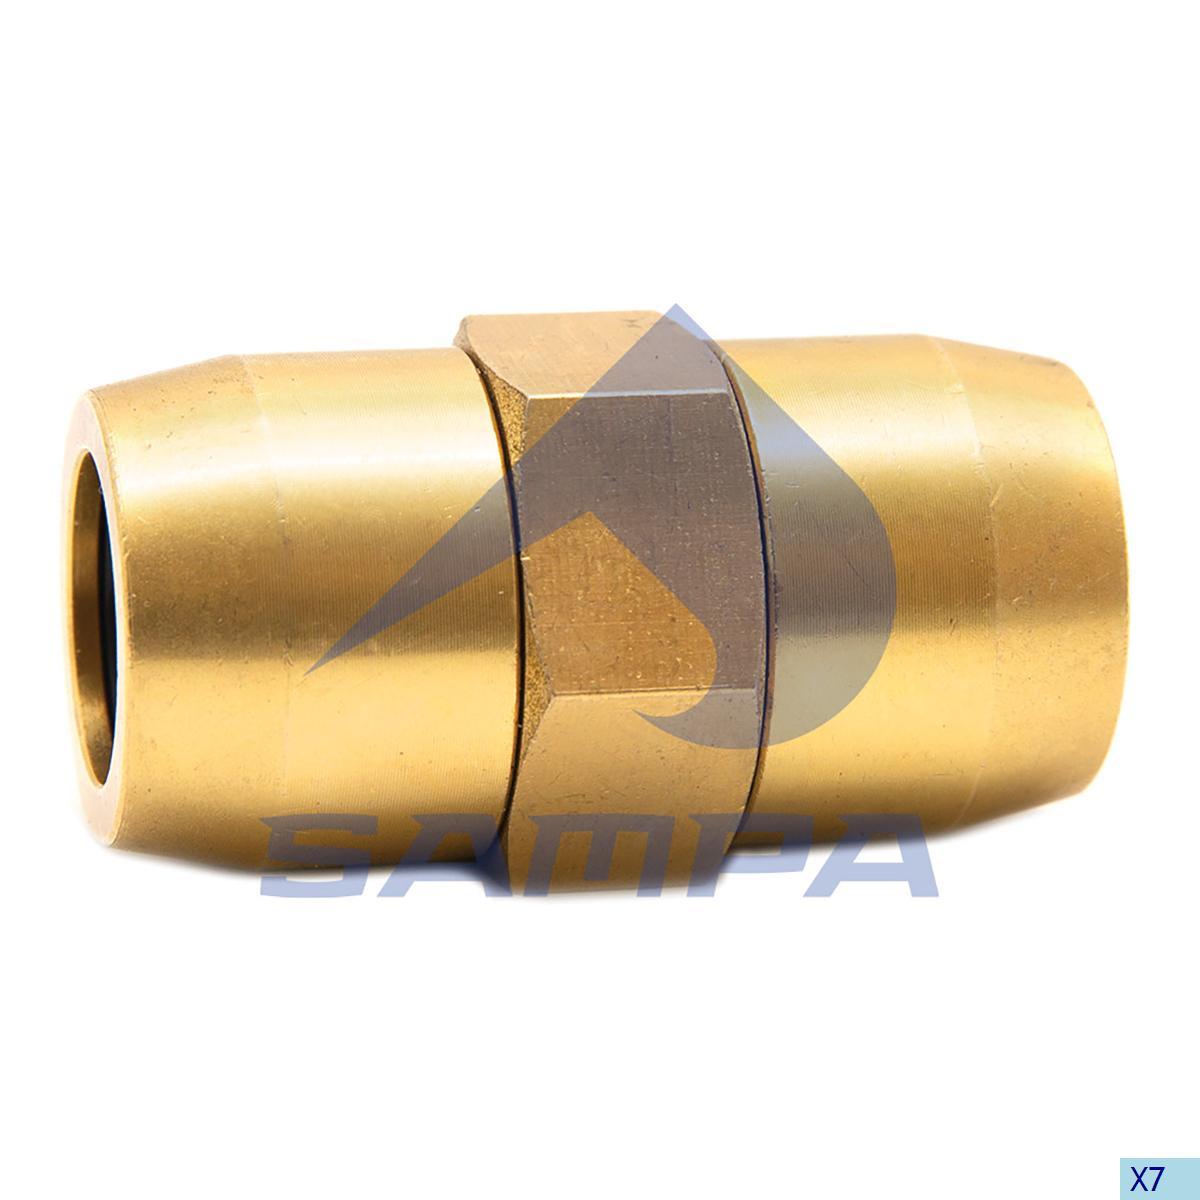 Pipe Coupling, Universal, Universal Parts